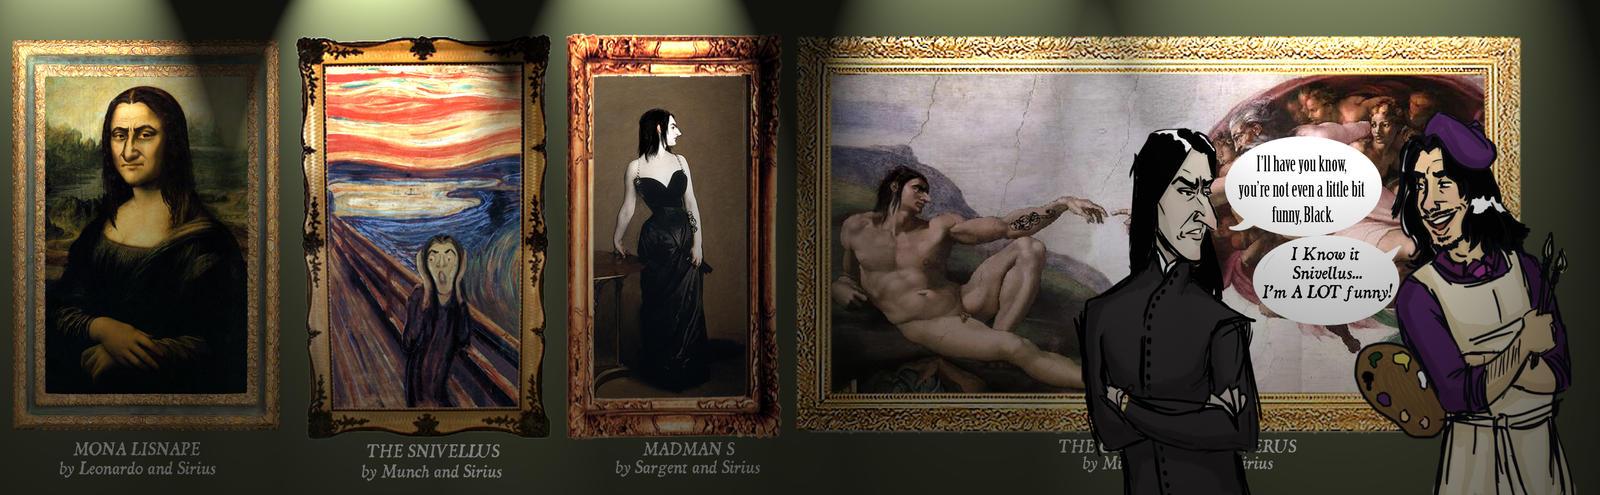 http://fc06.deviantart.net/fs71/i/2010/176/9/8/Sirius_The_Artist_by_MistressBlackwater.jpg